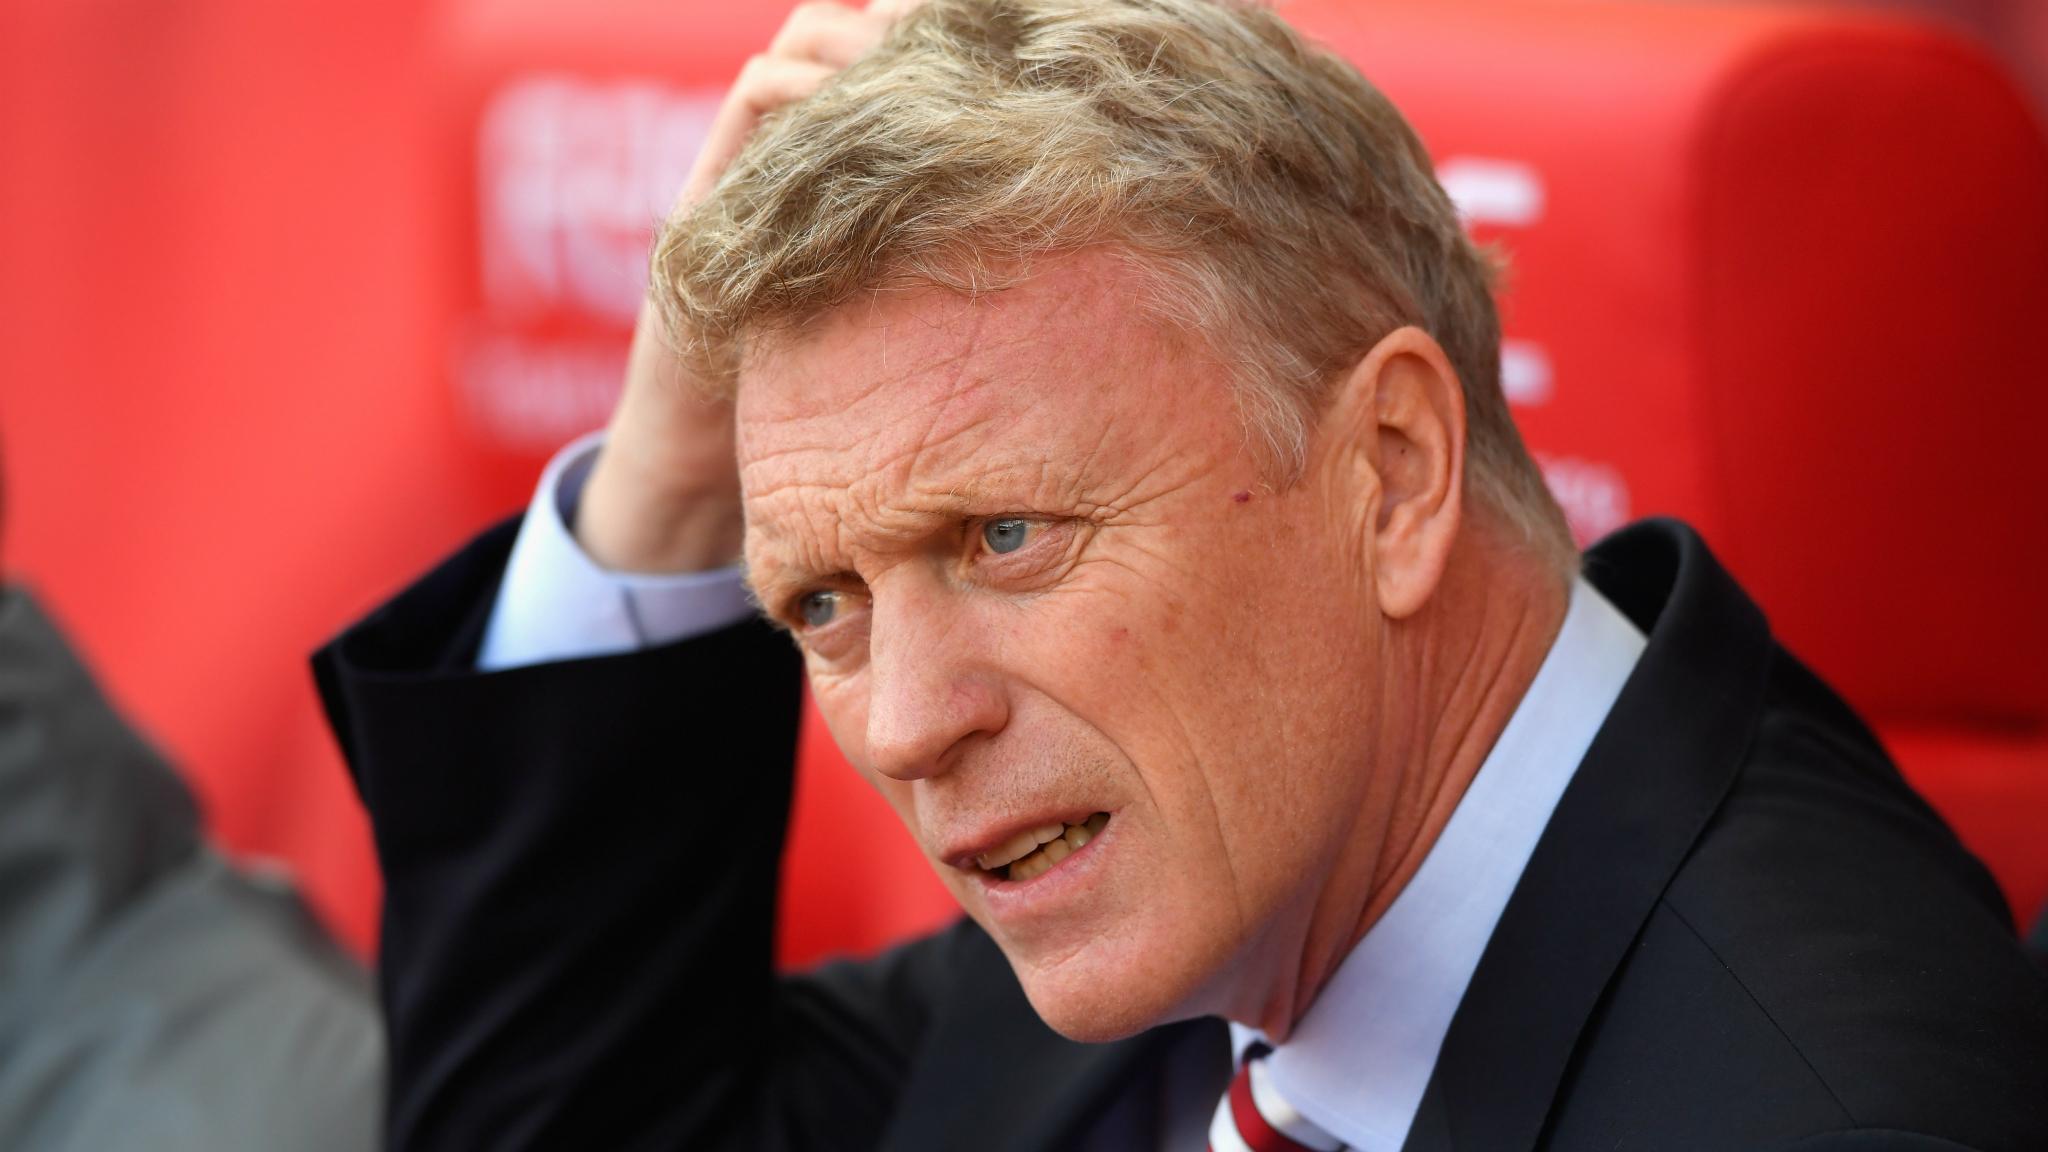 Sunderland must stop feeling sorry for themselves